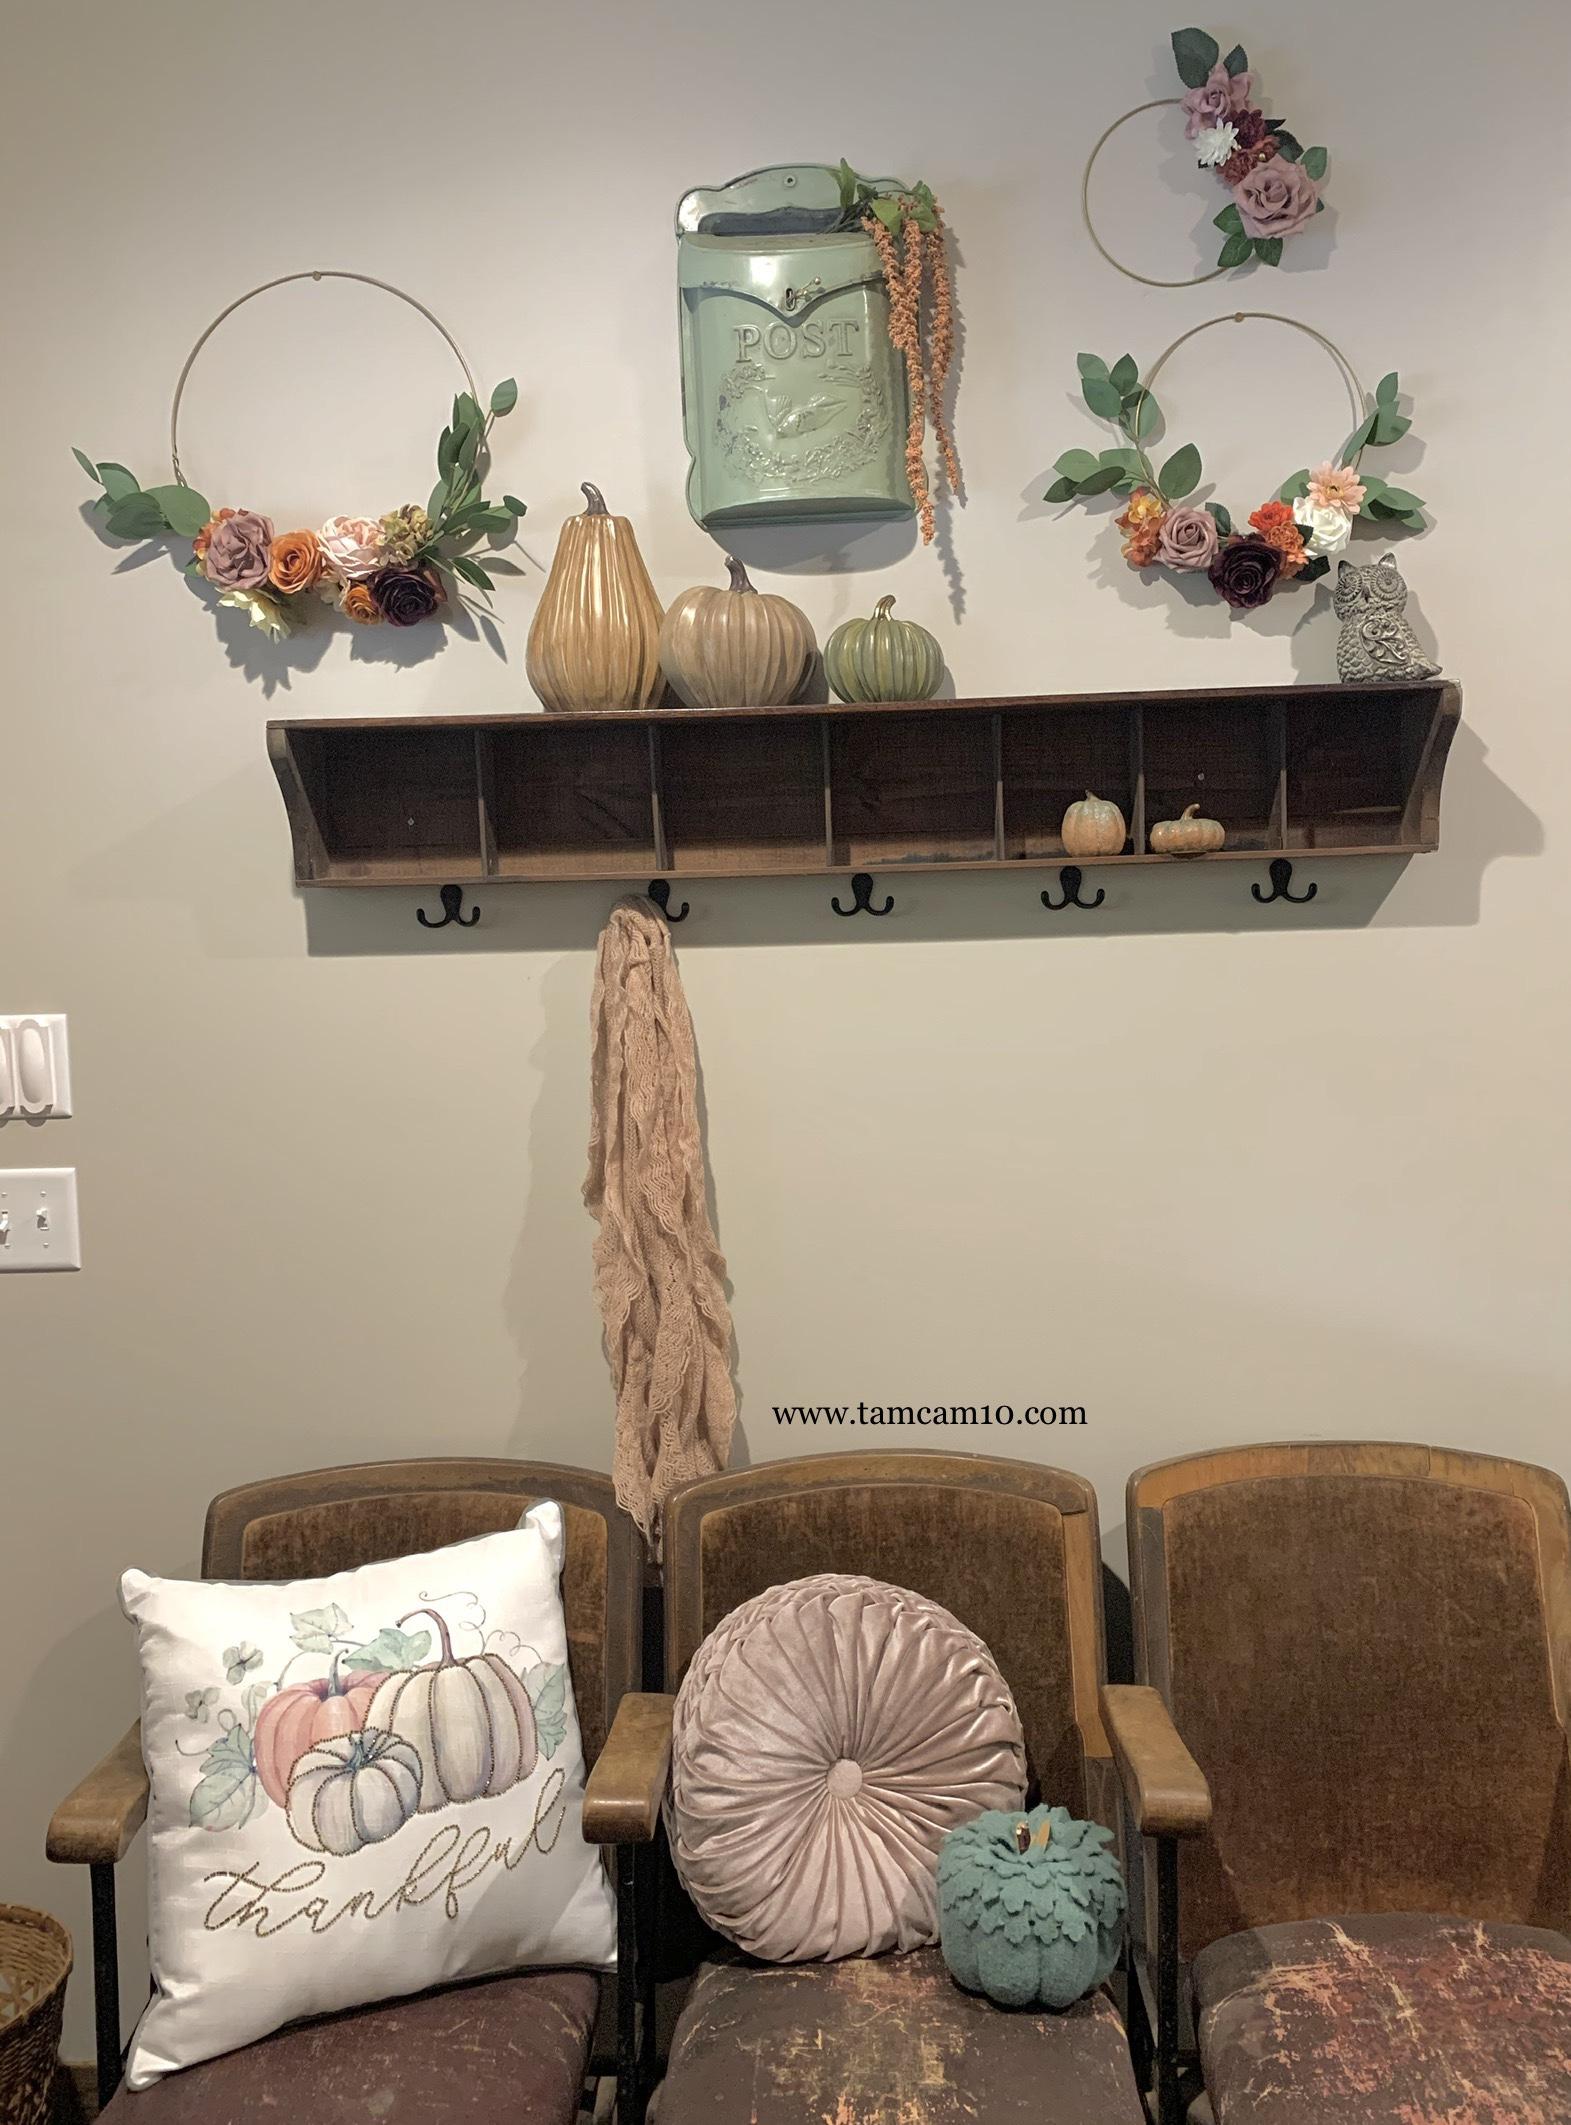 Fall Decor | Entry Way | Pretty Fall | Floral Hoops | Fall Florals | Fall Decor Ideas | Pumpkins | Thankful | tamcam10